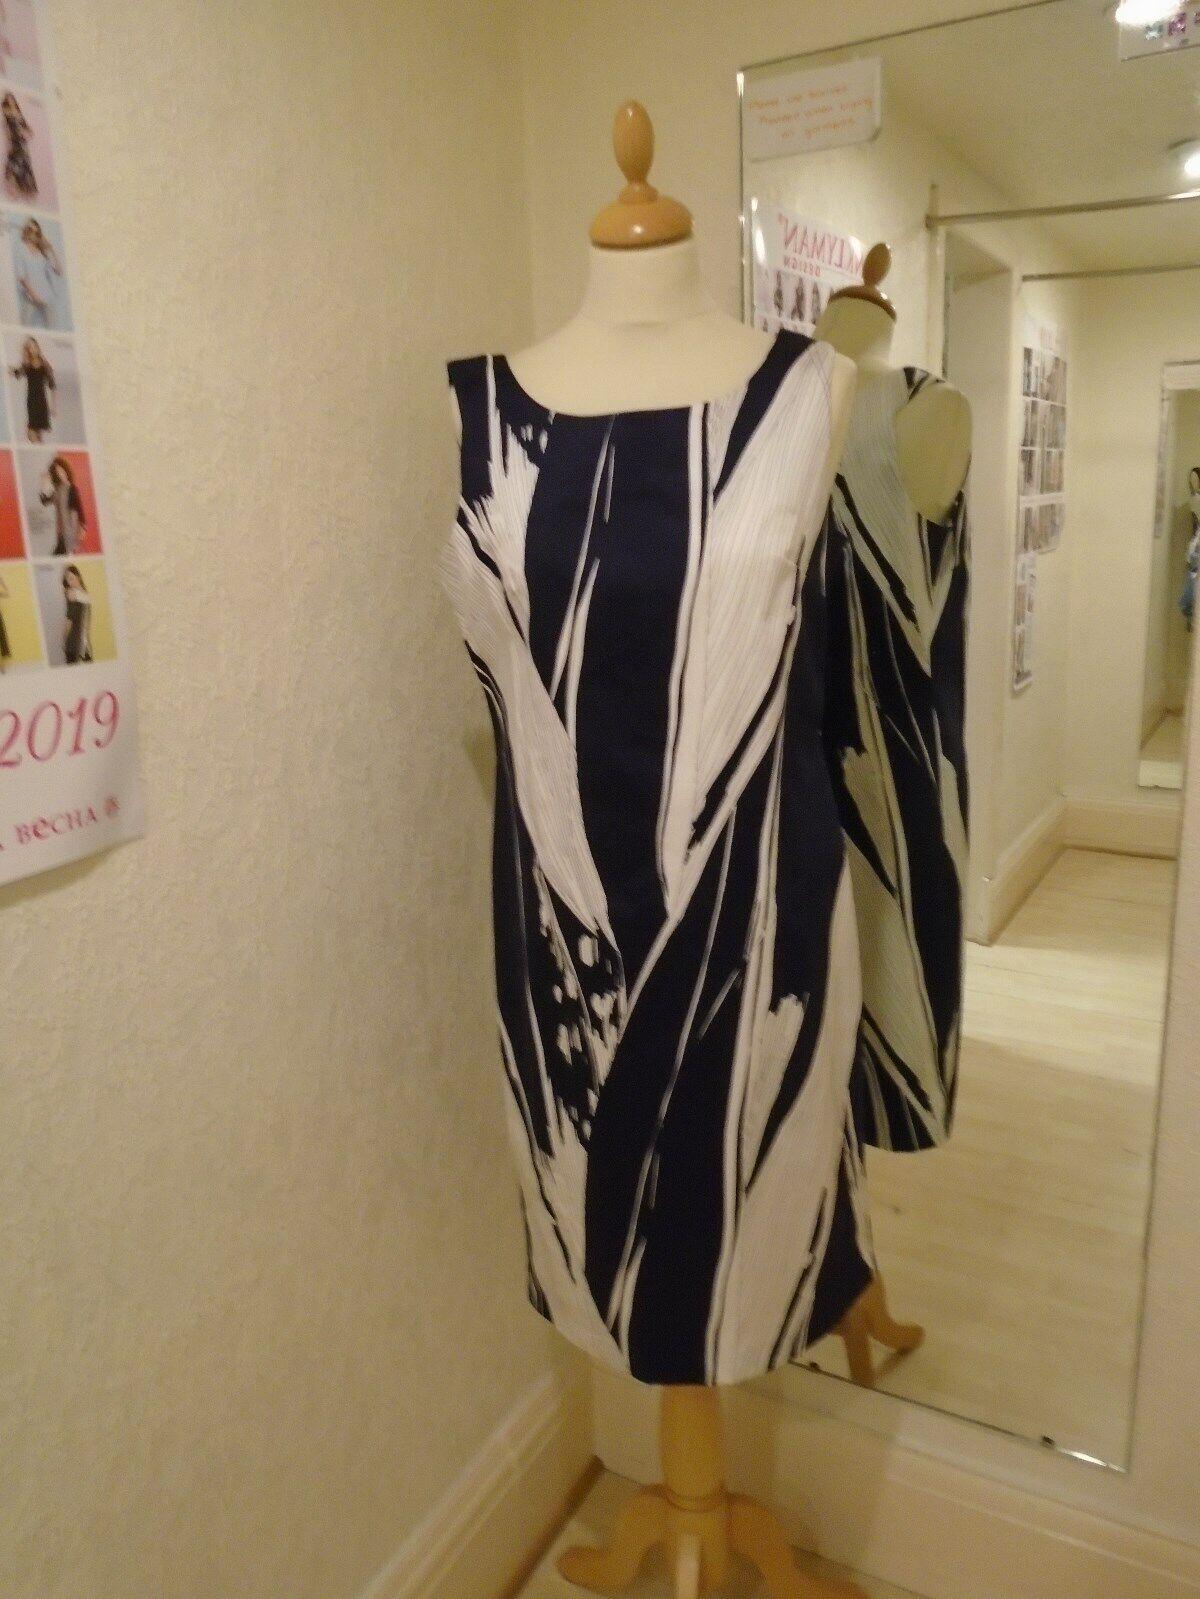 Pomodgold Navy CONTOUR Shift dress size 10 11803